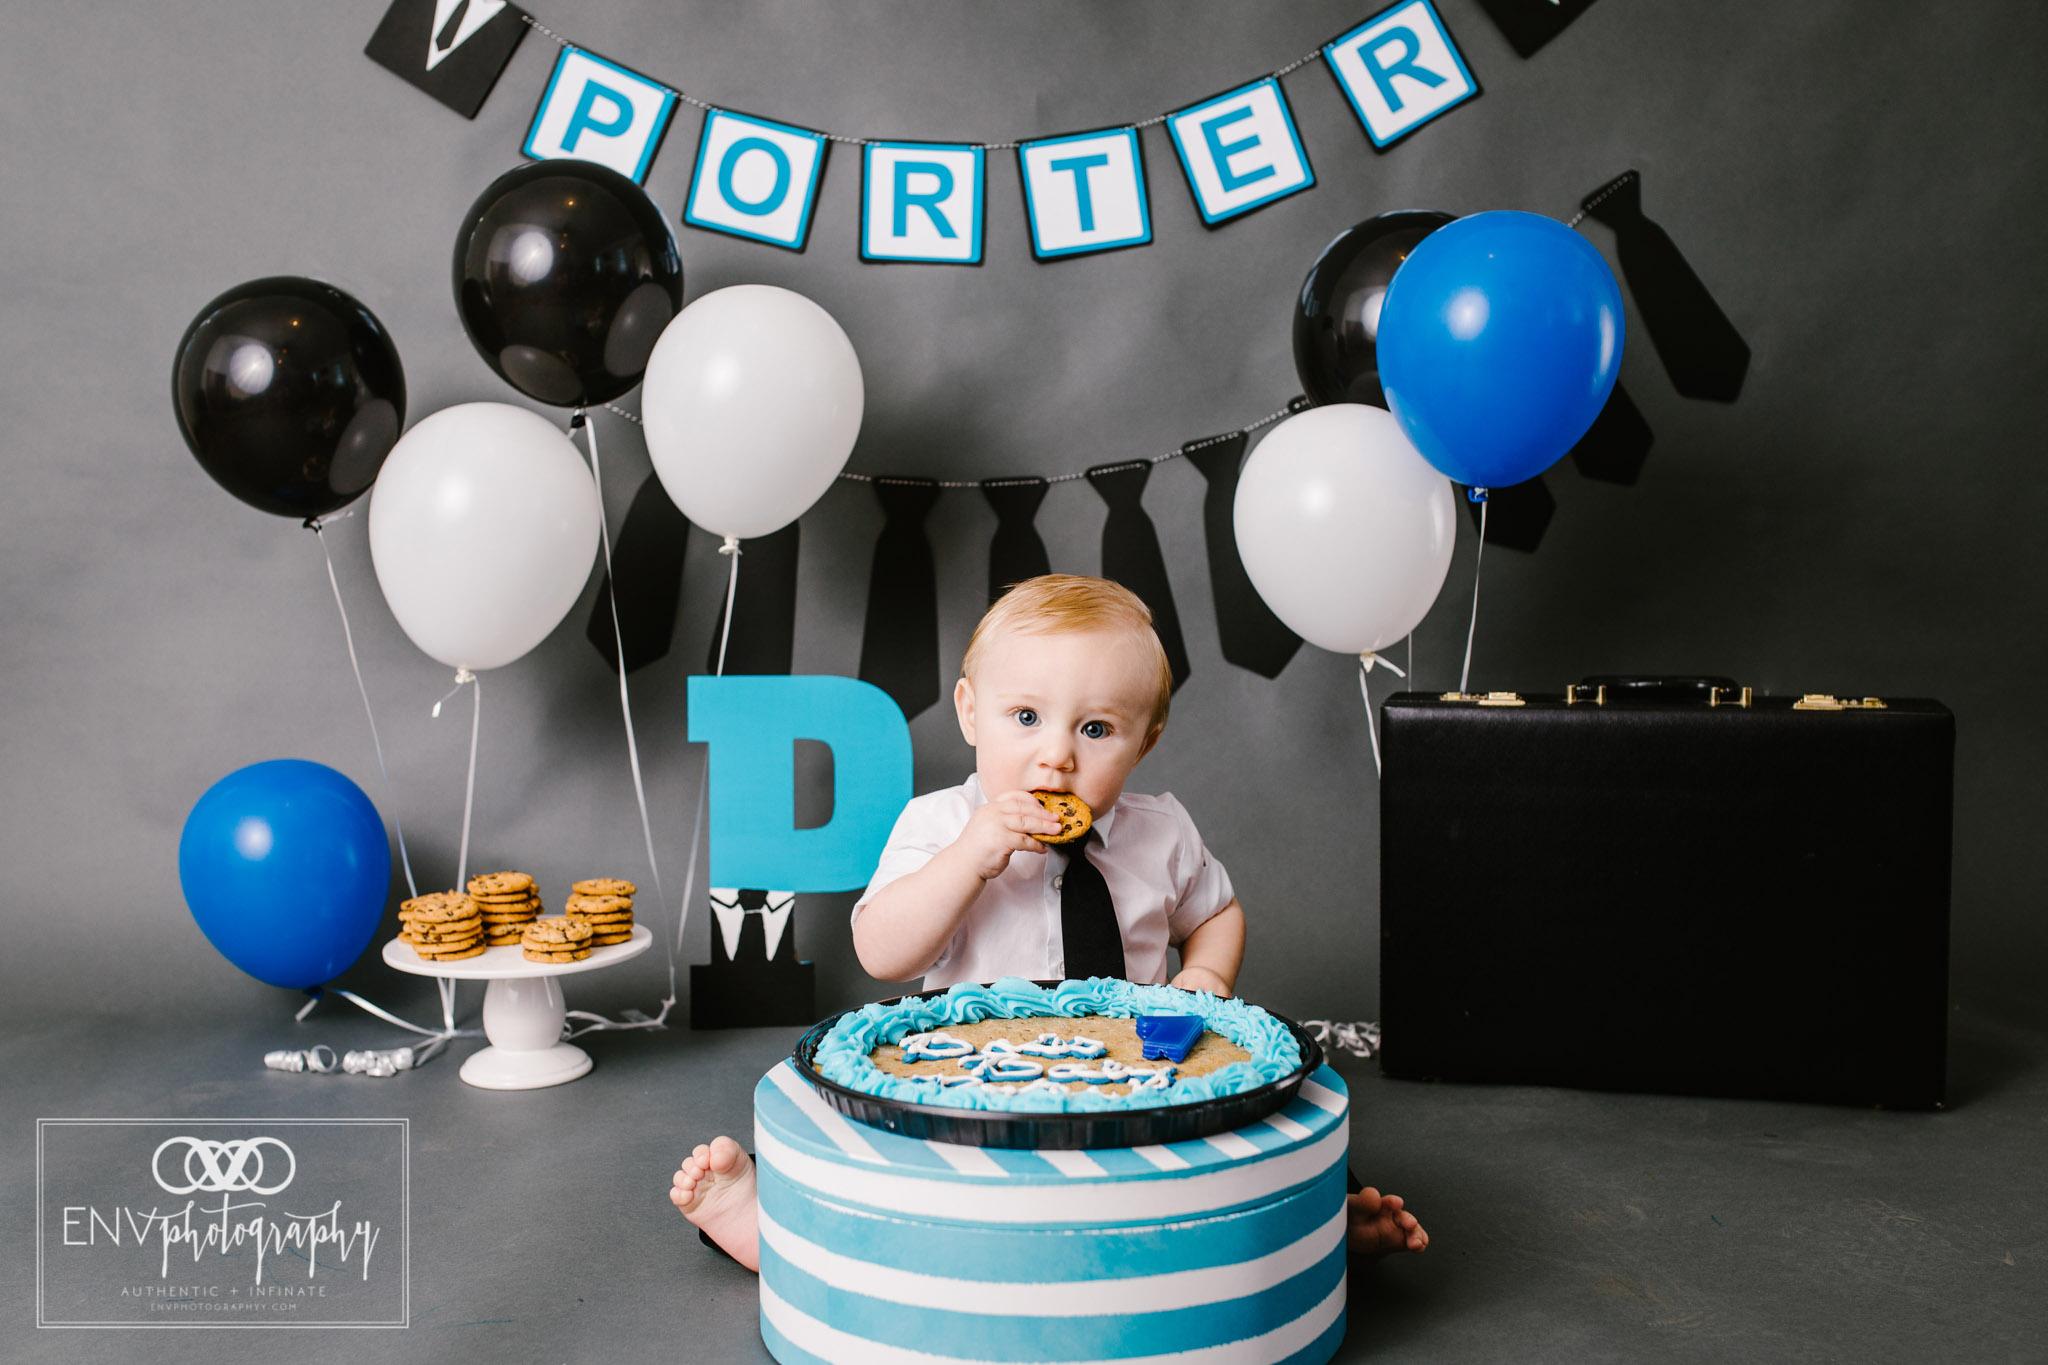 Porterfirstbirthday (42).jpg